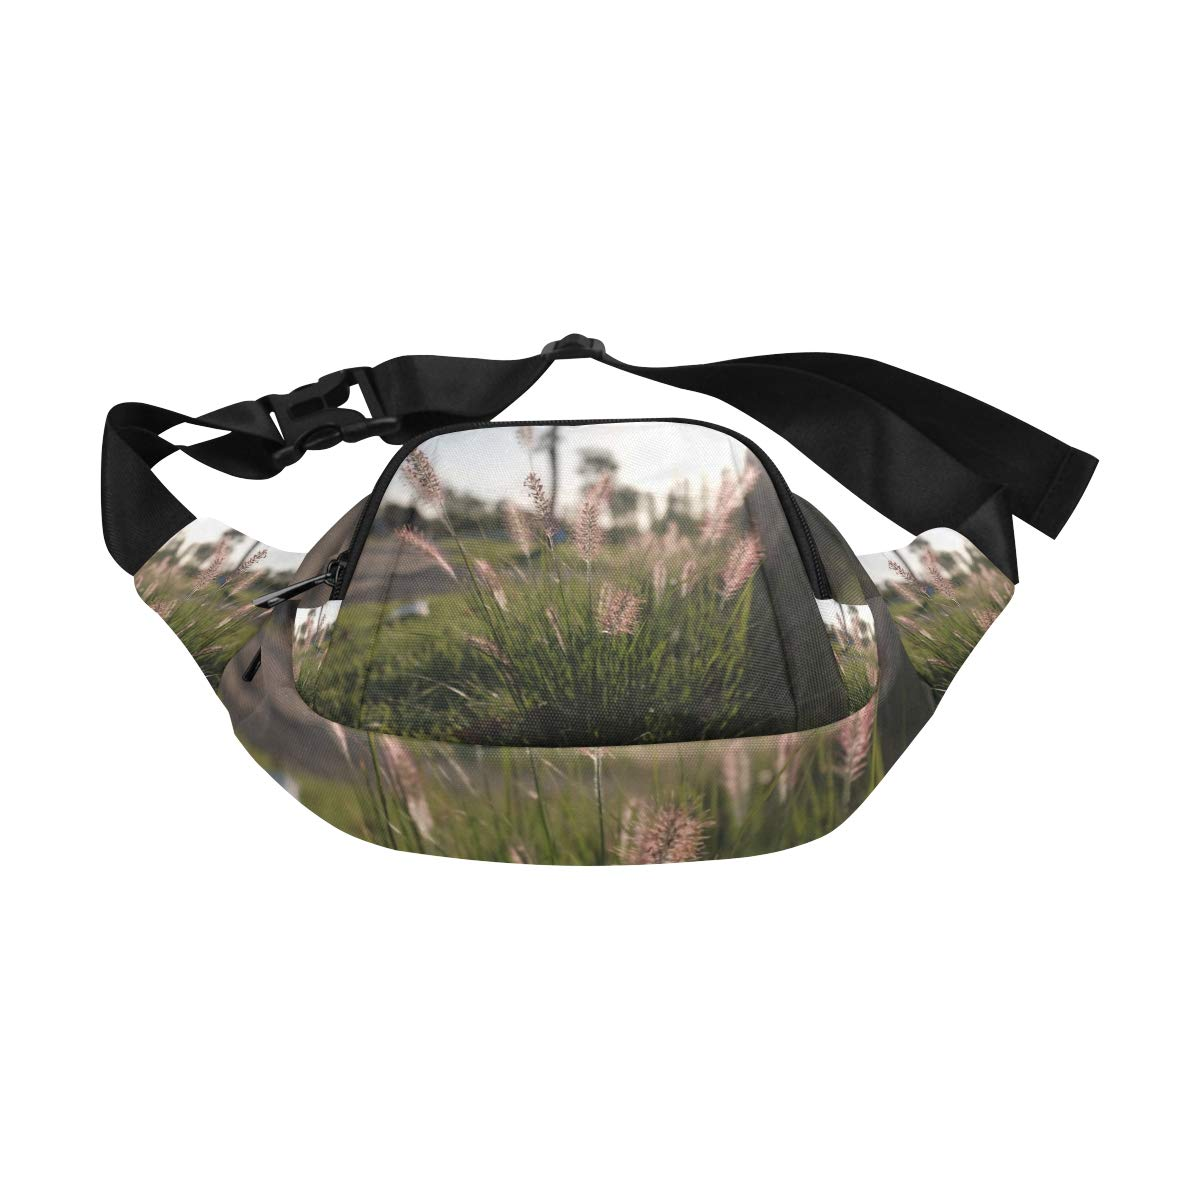 Beautiful Meadow Bristle-grass Fenny Packs Waist Bags Adjustable Belt Waterproof Nylon Travel Running Sport Vacation Party For Men Women Boys Girls Kids